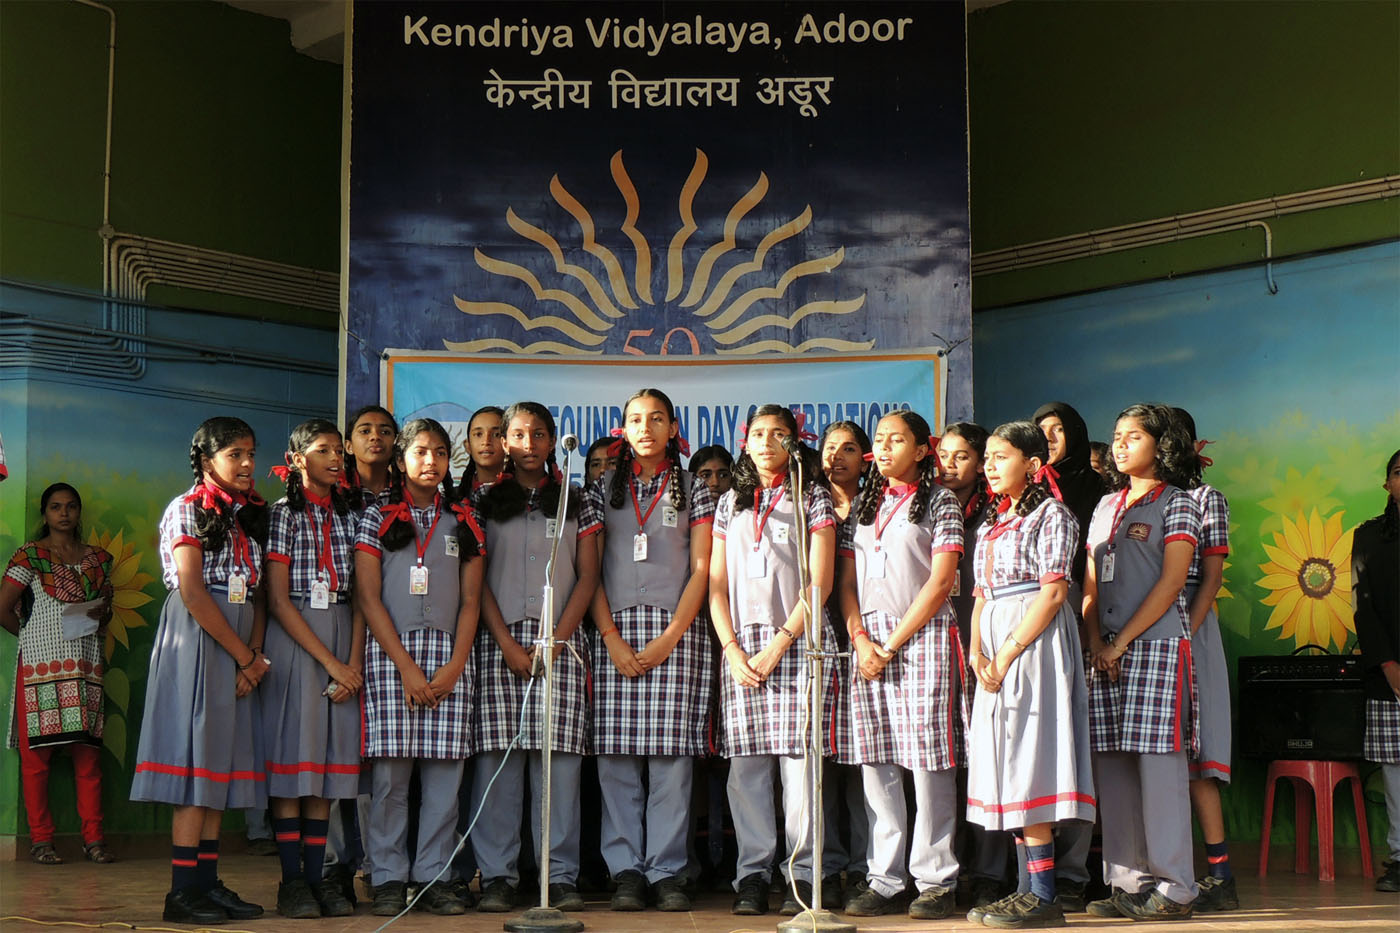 kendriya vidyalaya adoor shift i About kendriya vidyalaya, adoor, kerala: sanction for the school came on 18-06-1993 the school office opened on 09-08-1993 with 1 principal,1 teacher,1 l d c and 1 groupd.